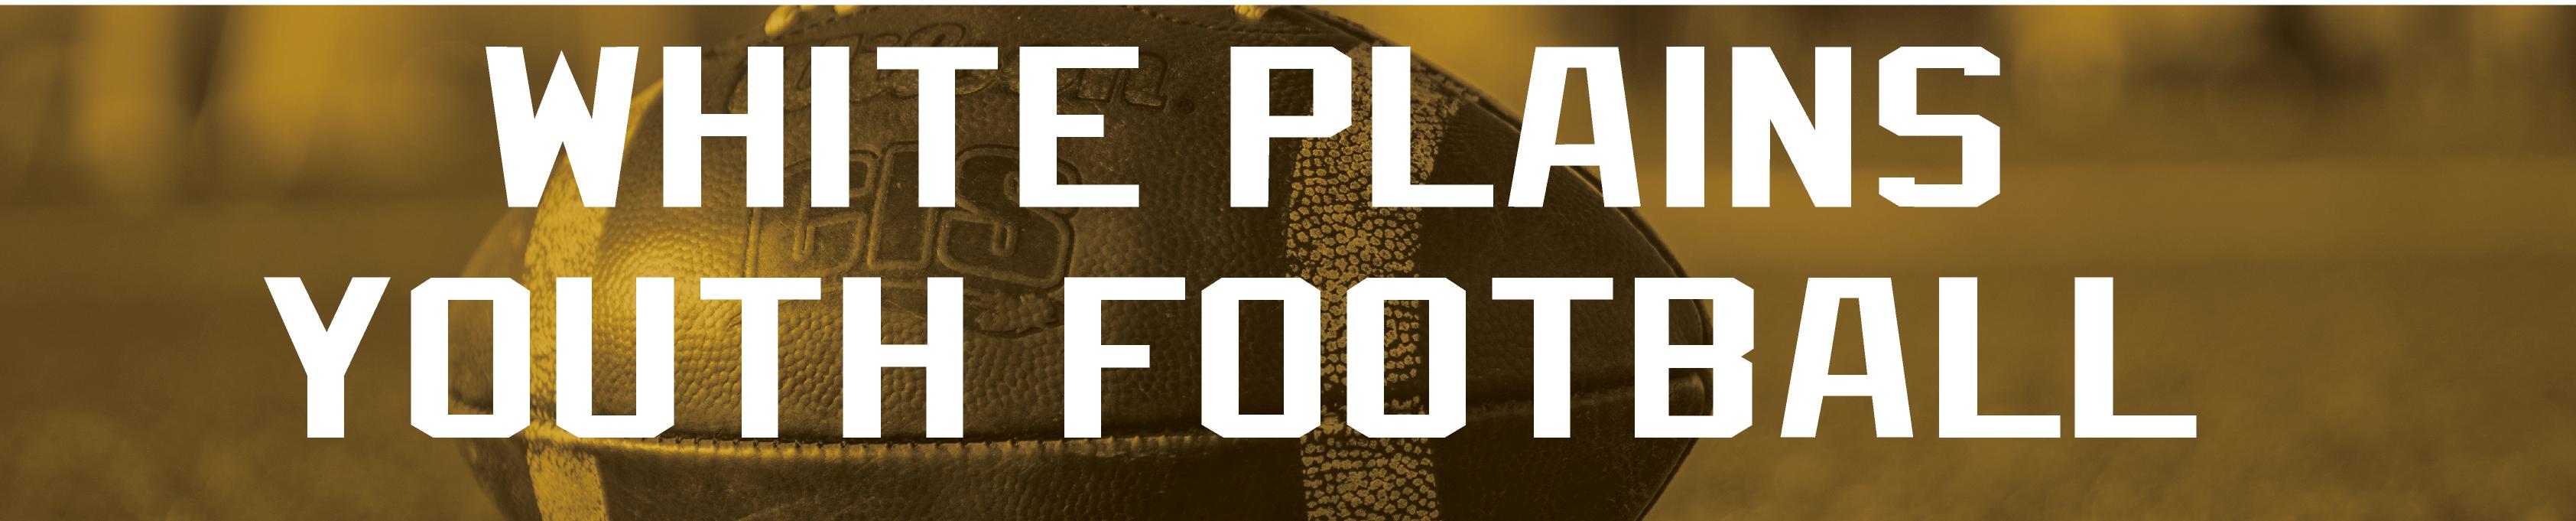 White Plains Youth Football